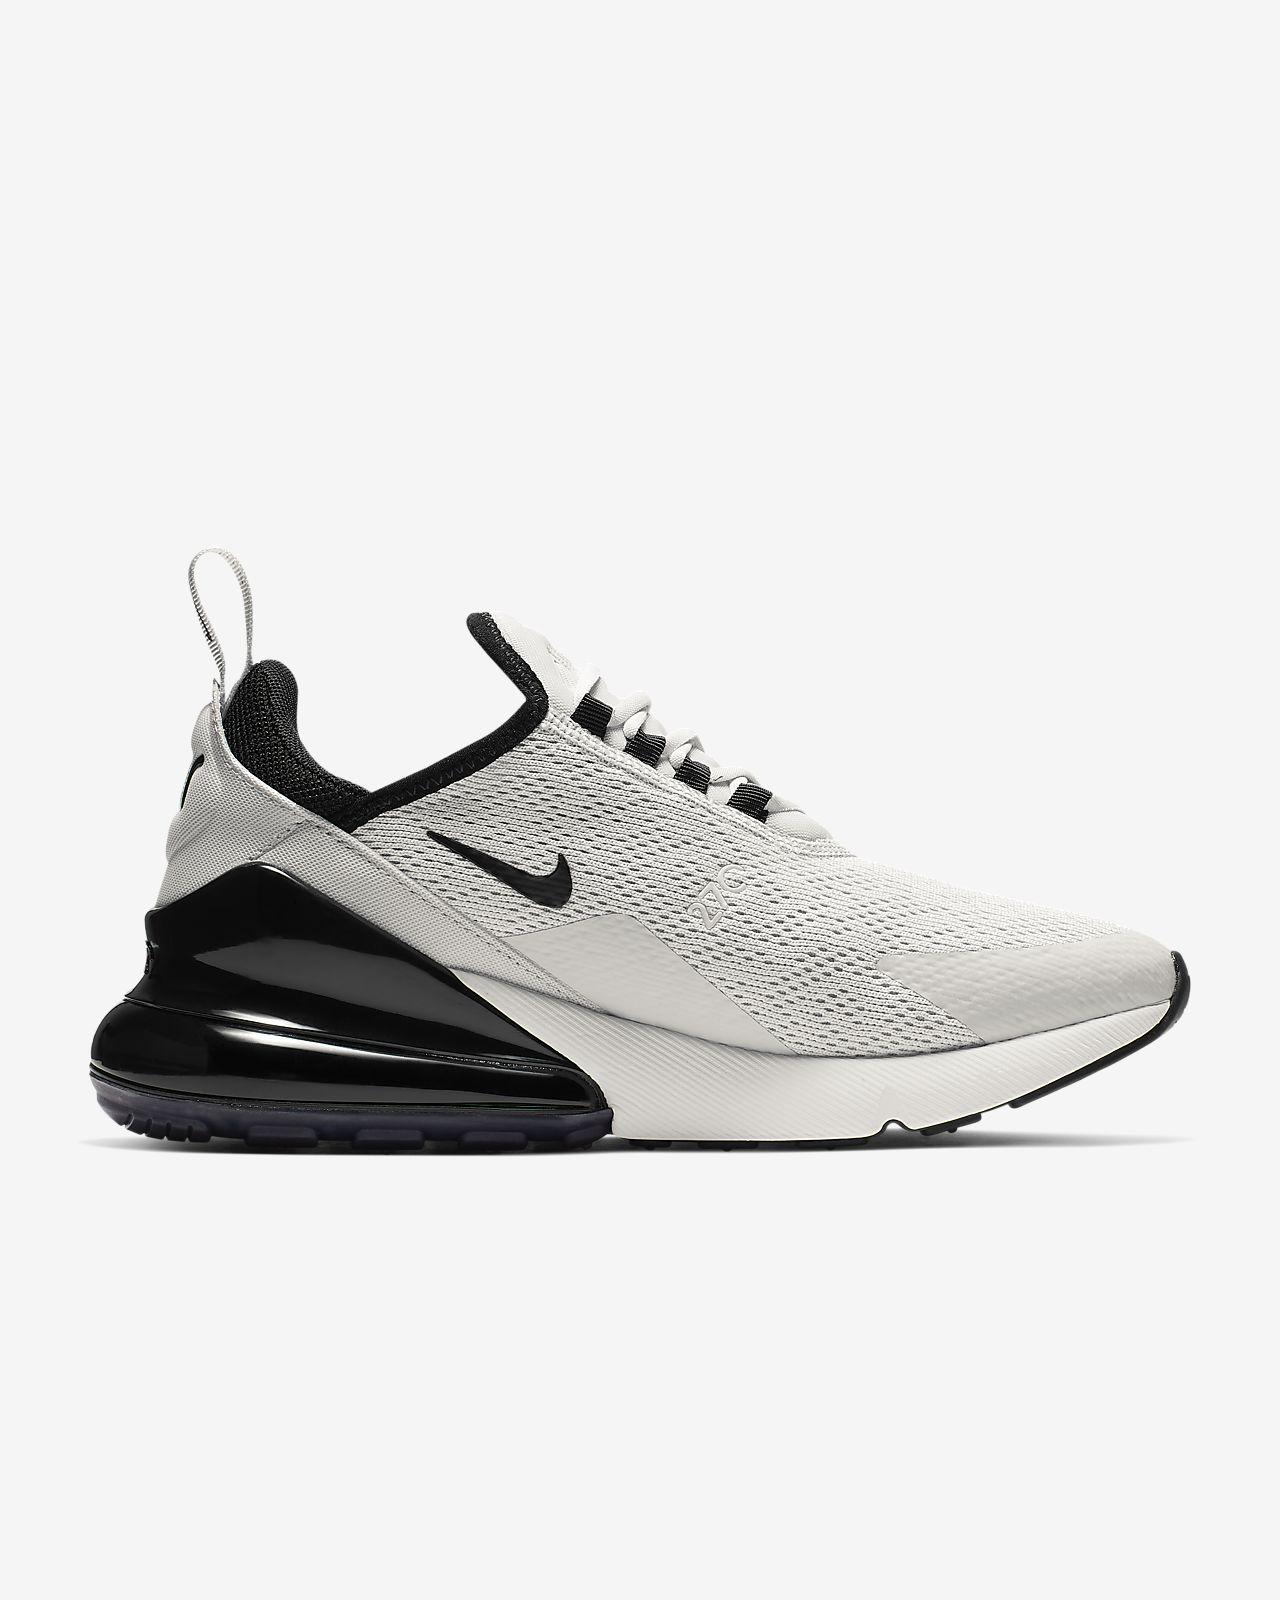 12d3678934 Nike Air Max 270 Women's Shoe. Nike.com ID